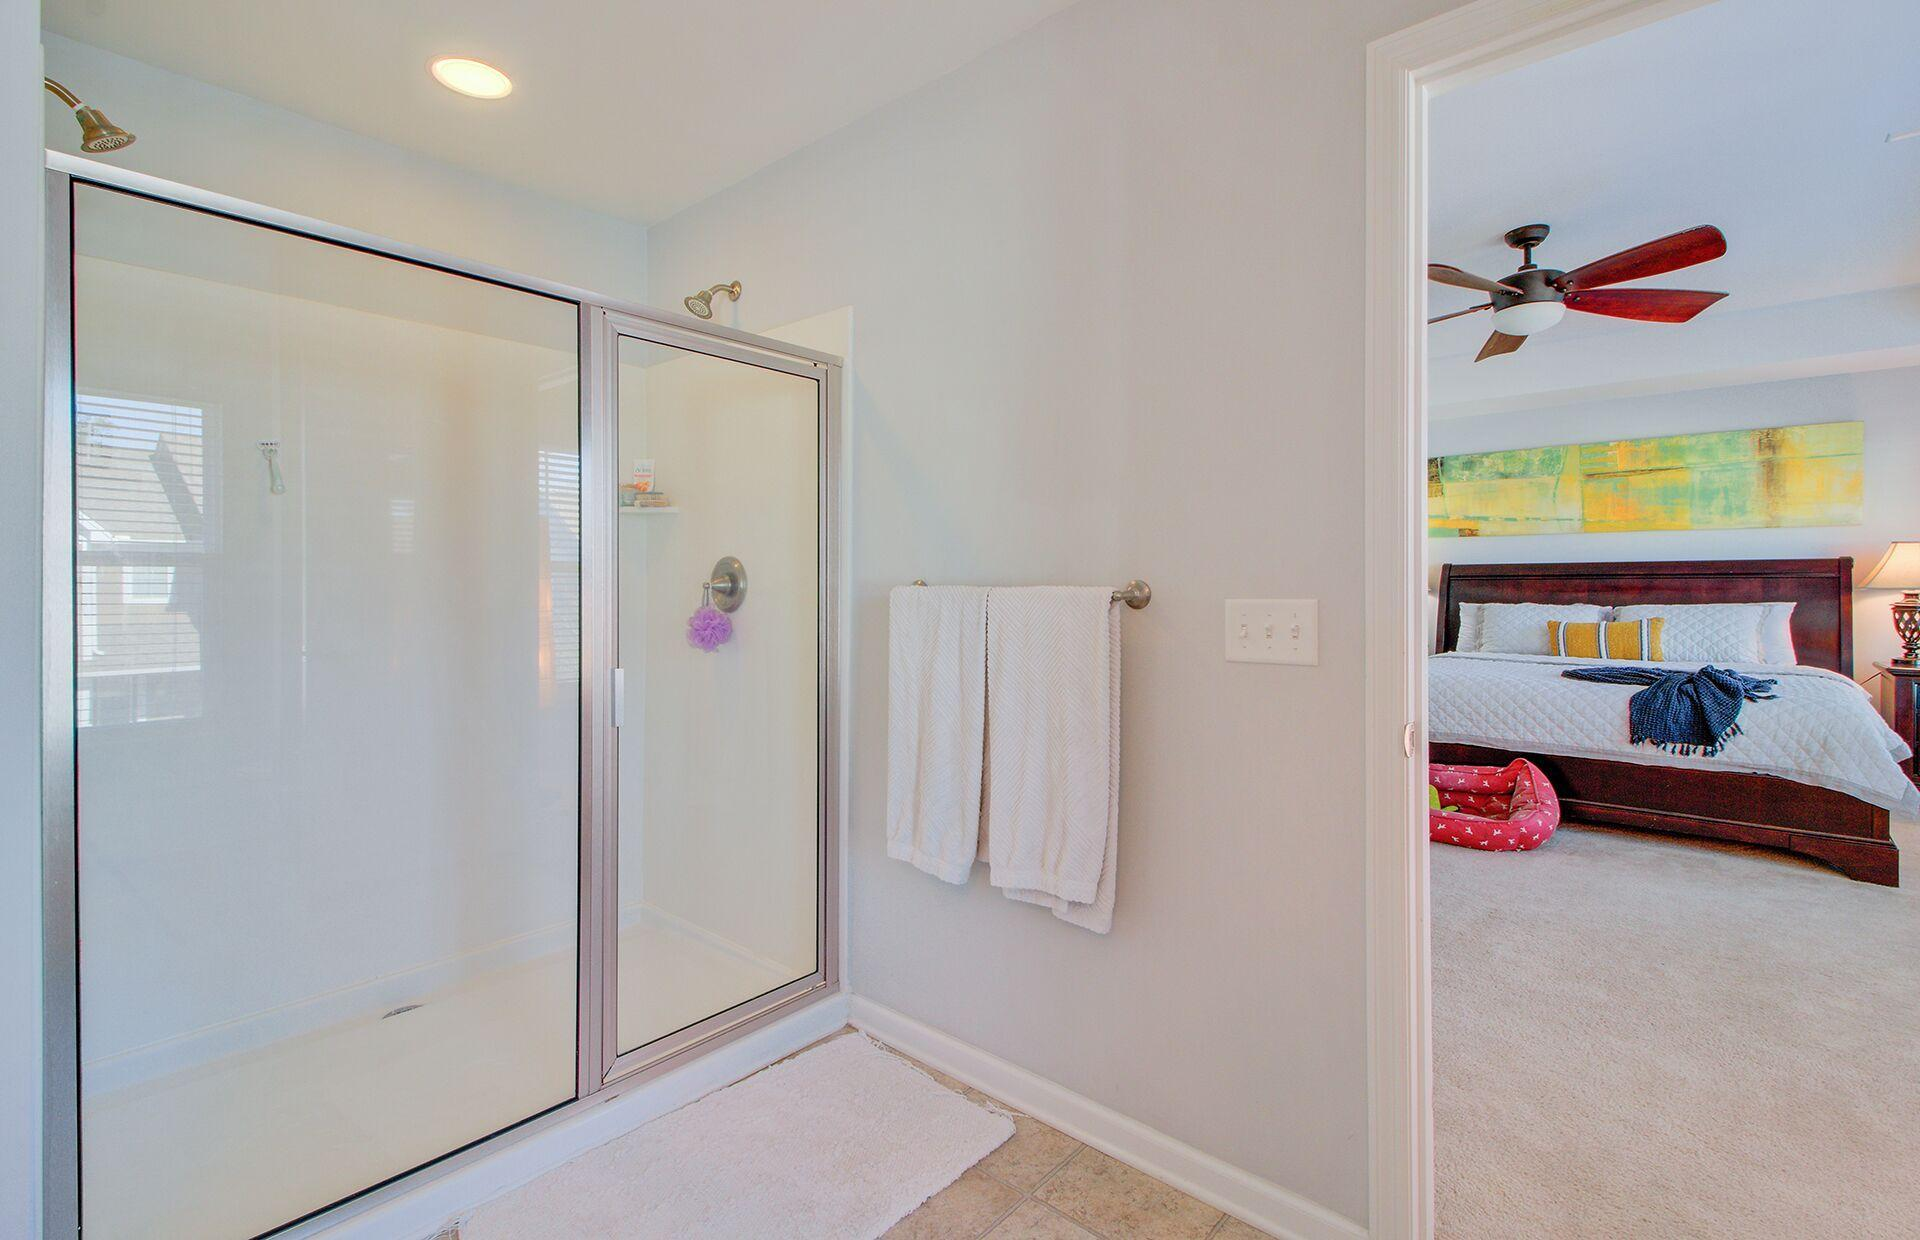 Oak Terrace Preserve Homes For Sale - 4967 Liberty Park, North Charleston, SC - 21